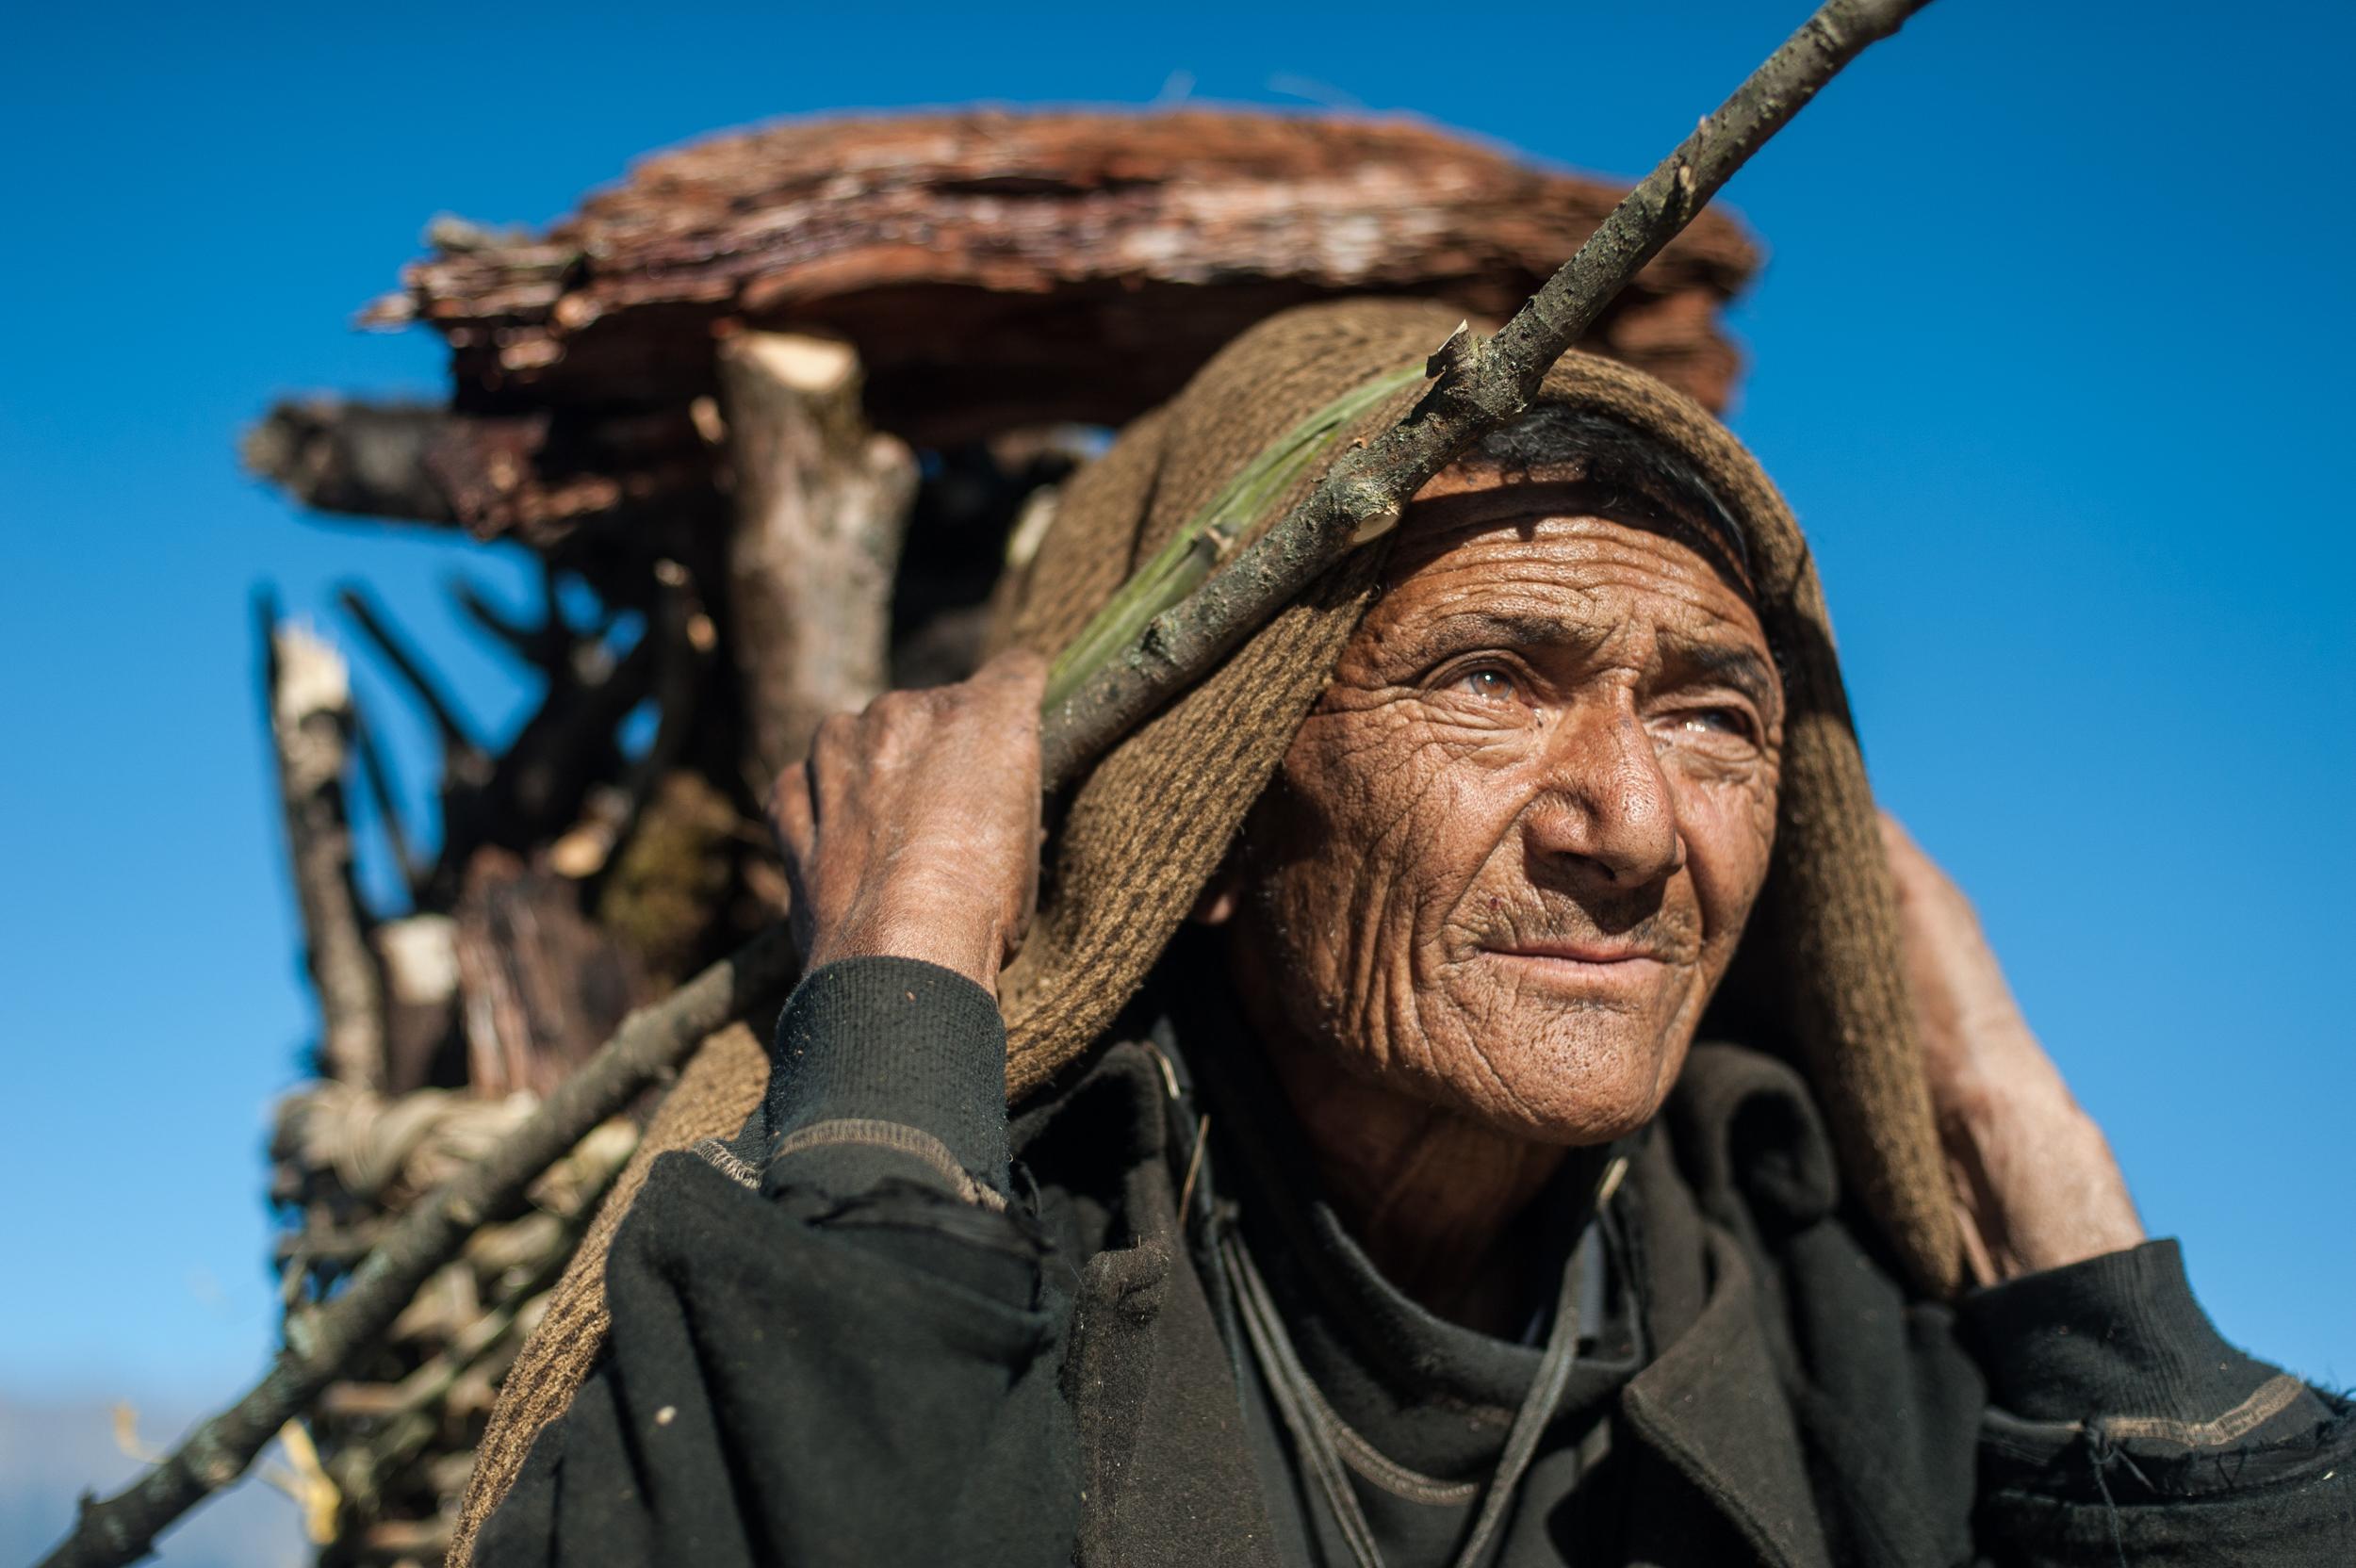 An elderly Gurung man from the Manaslu region in Nepal carries firewood.